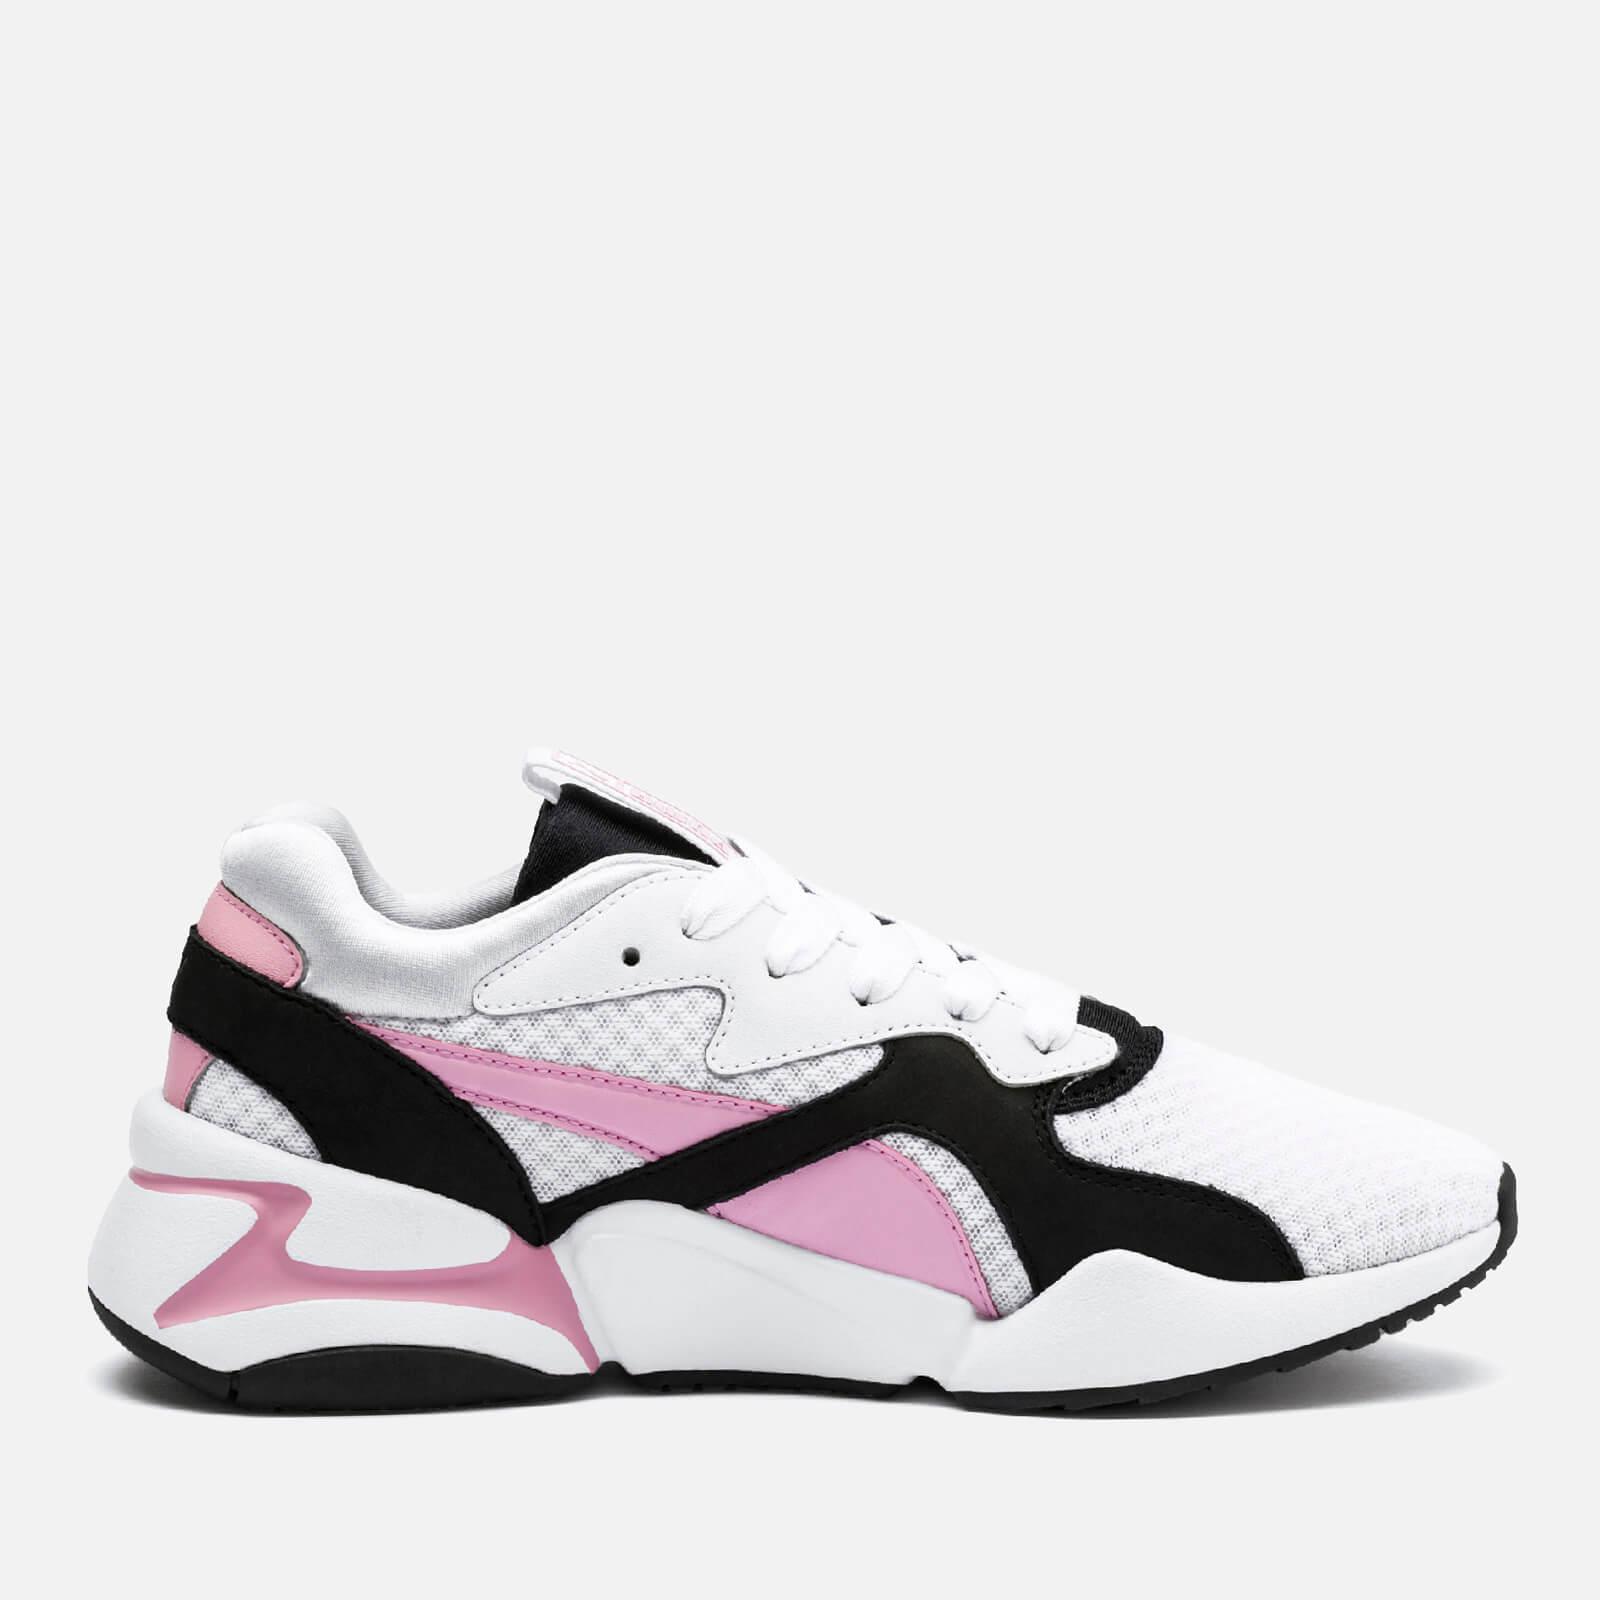 bde878144 Puma Women's Nova 90's Block Trainers - Puma White/Pale Pink Womens  Footwear | TheHut.com